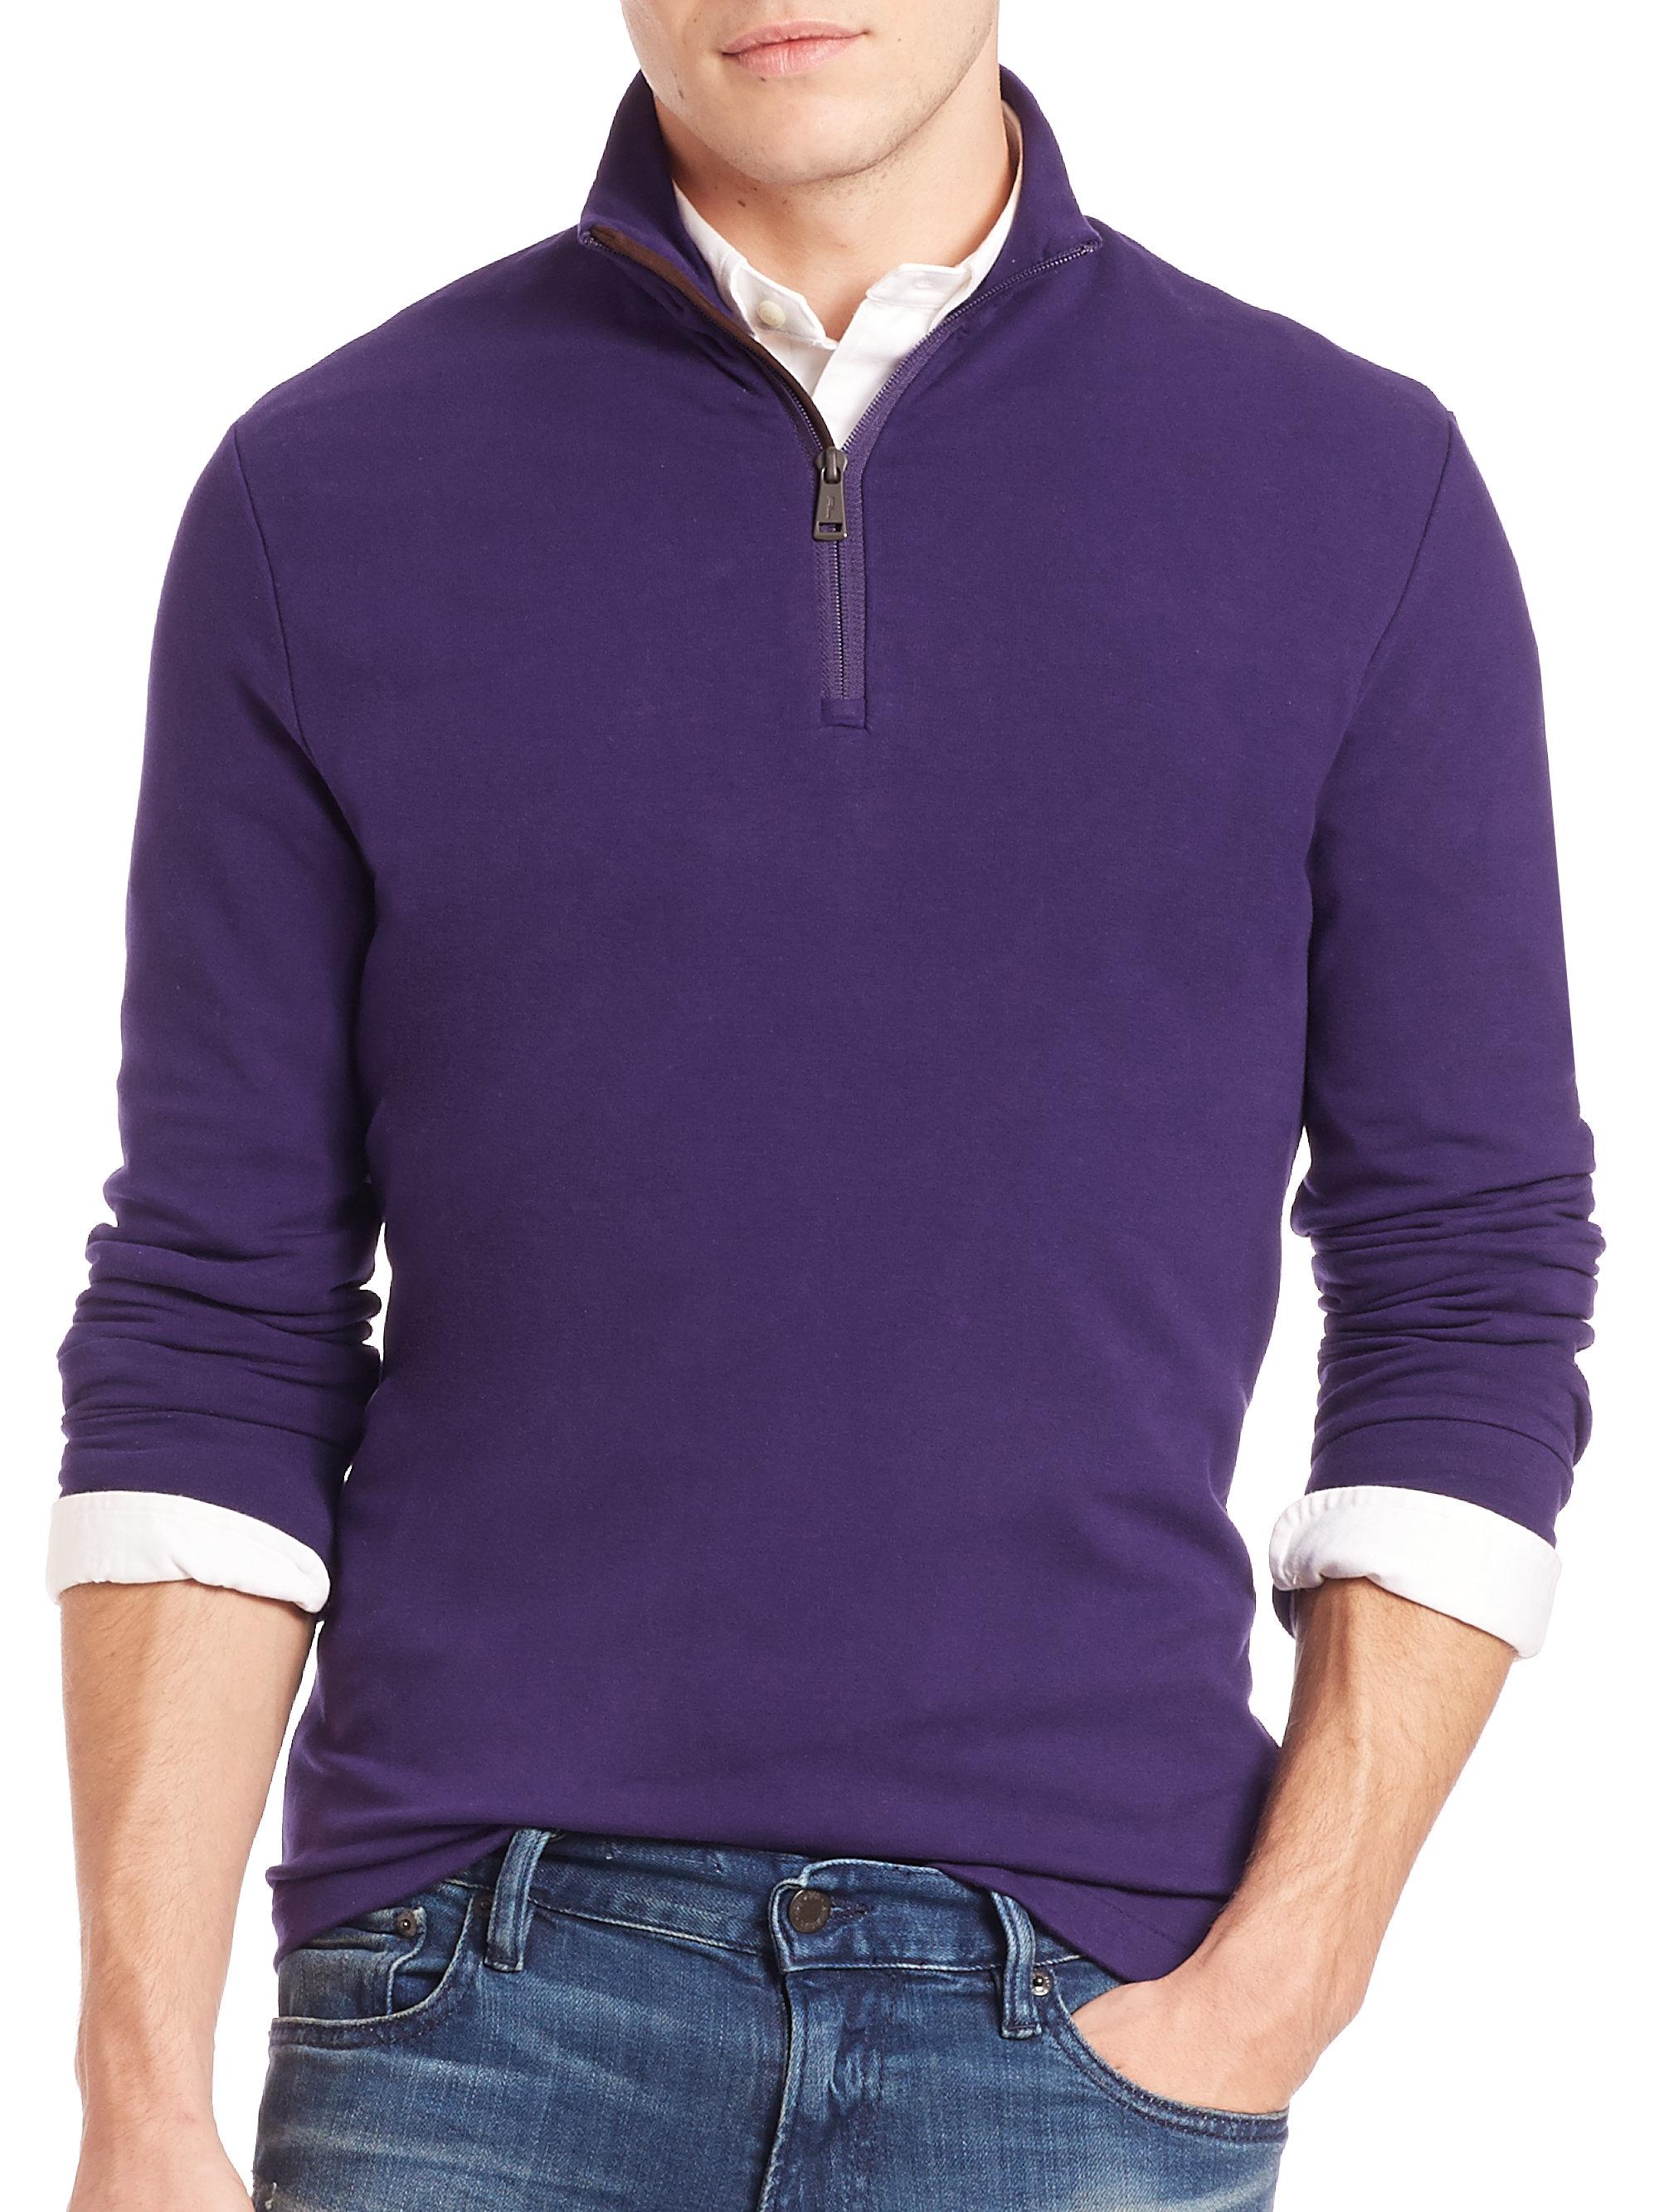 polo ralph lauren half zip pima cotton pullover in purple for men. Black Bedroom Furniture Sets. Home Design Ideas